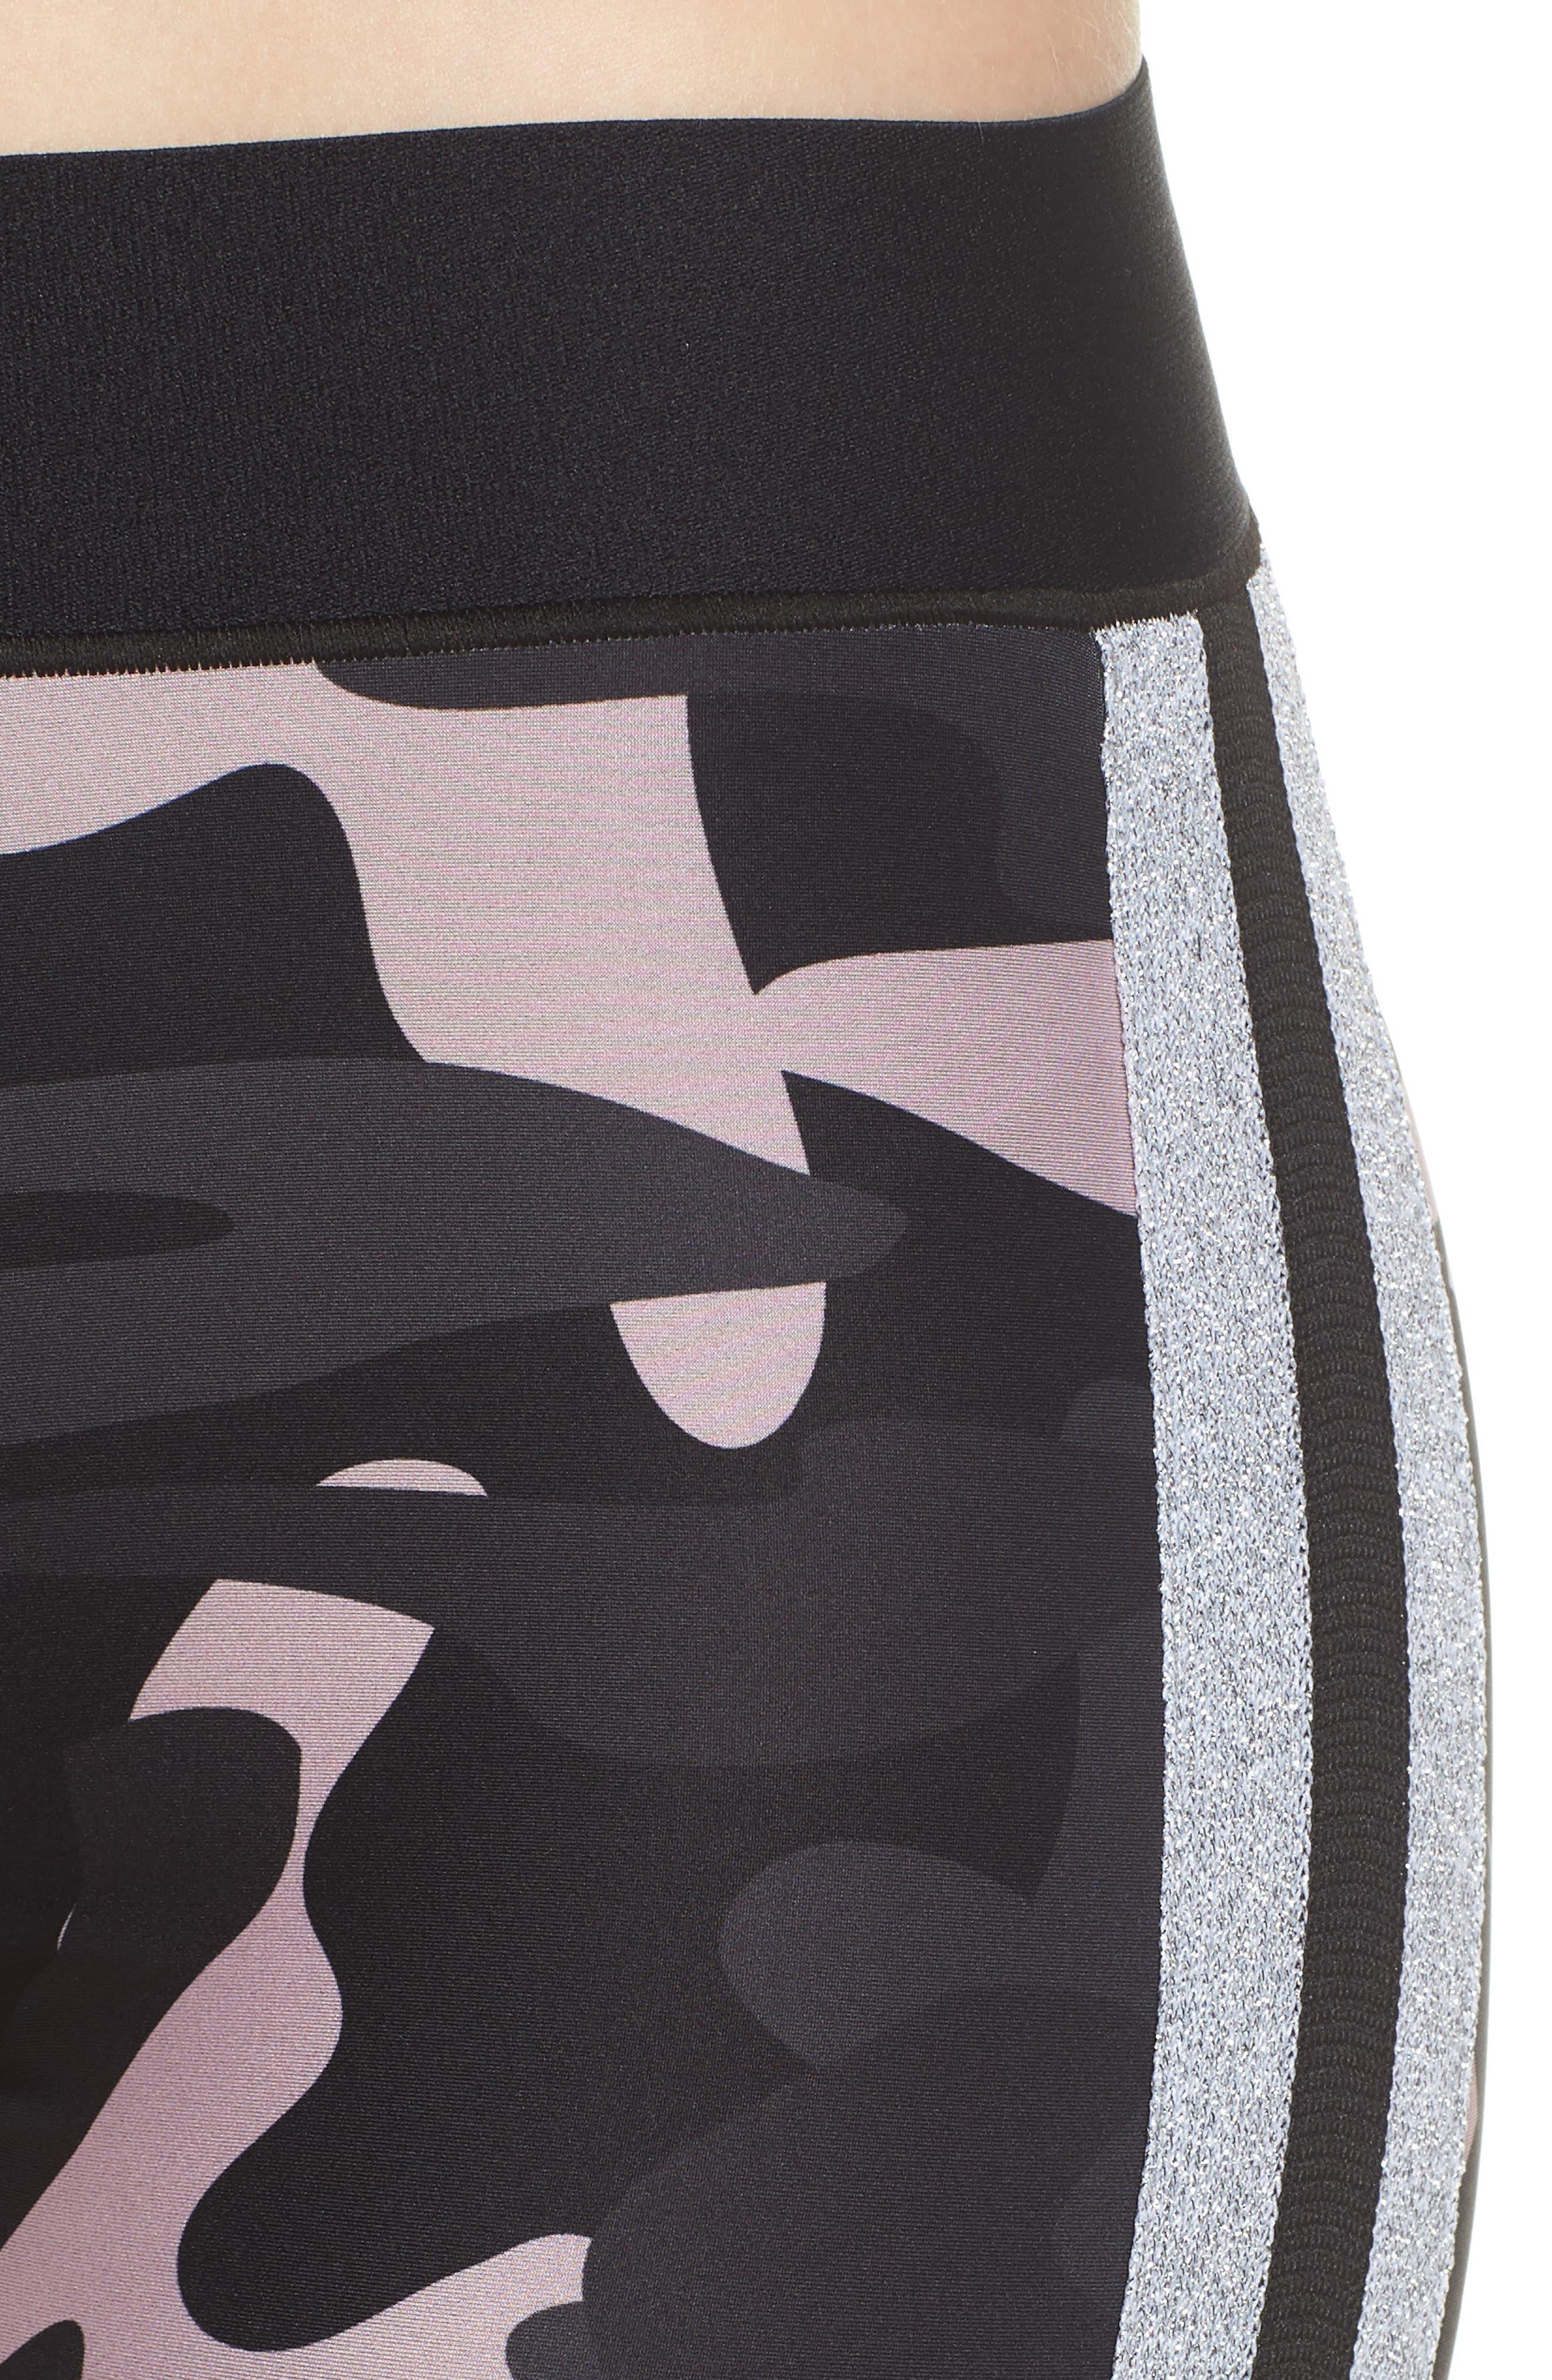 Ultra Camo Collegiate Leggings,                             Alternate thumbnail 4, color,                             Blush/ Silver